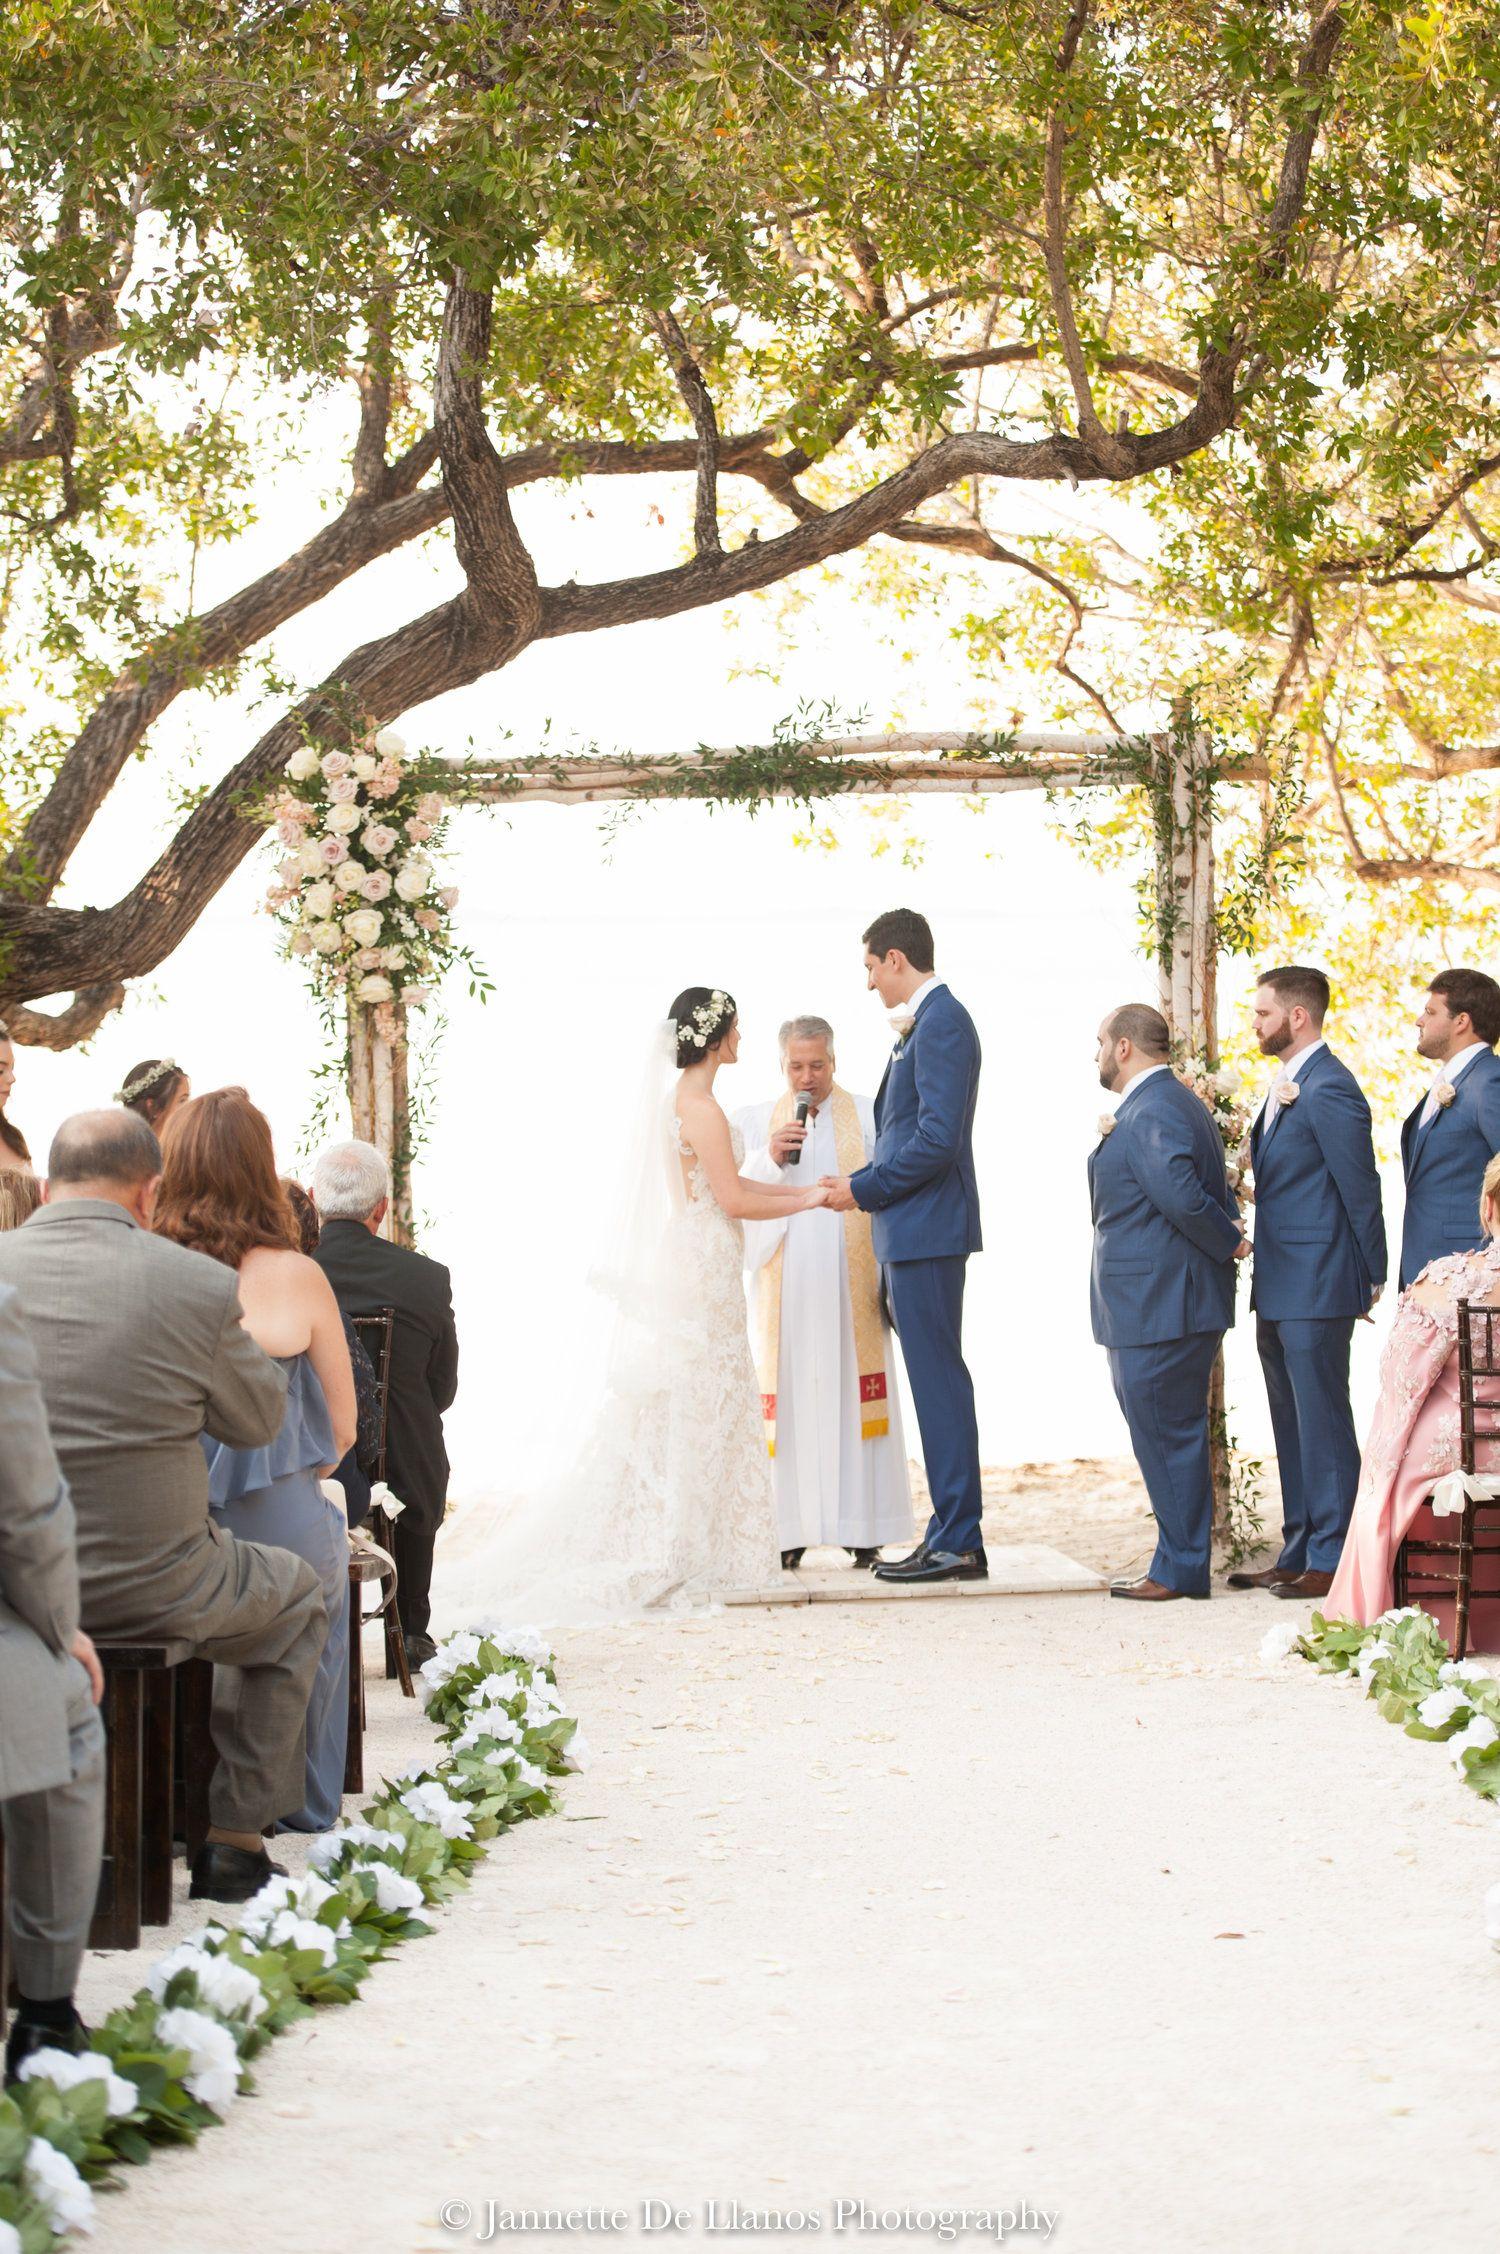 Florida Keys Wedding Photography Wedding In Key Largo At The Hilton Key La South Florida Wedding Photographer Florida Wedding Photographer Florida Keys Wedding